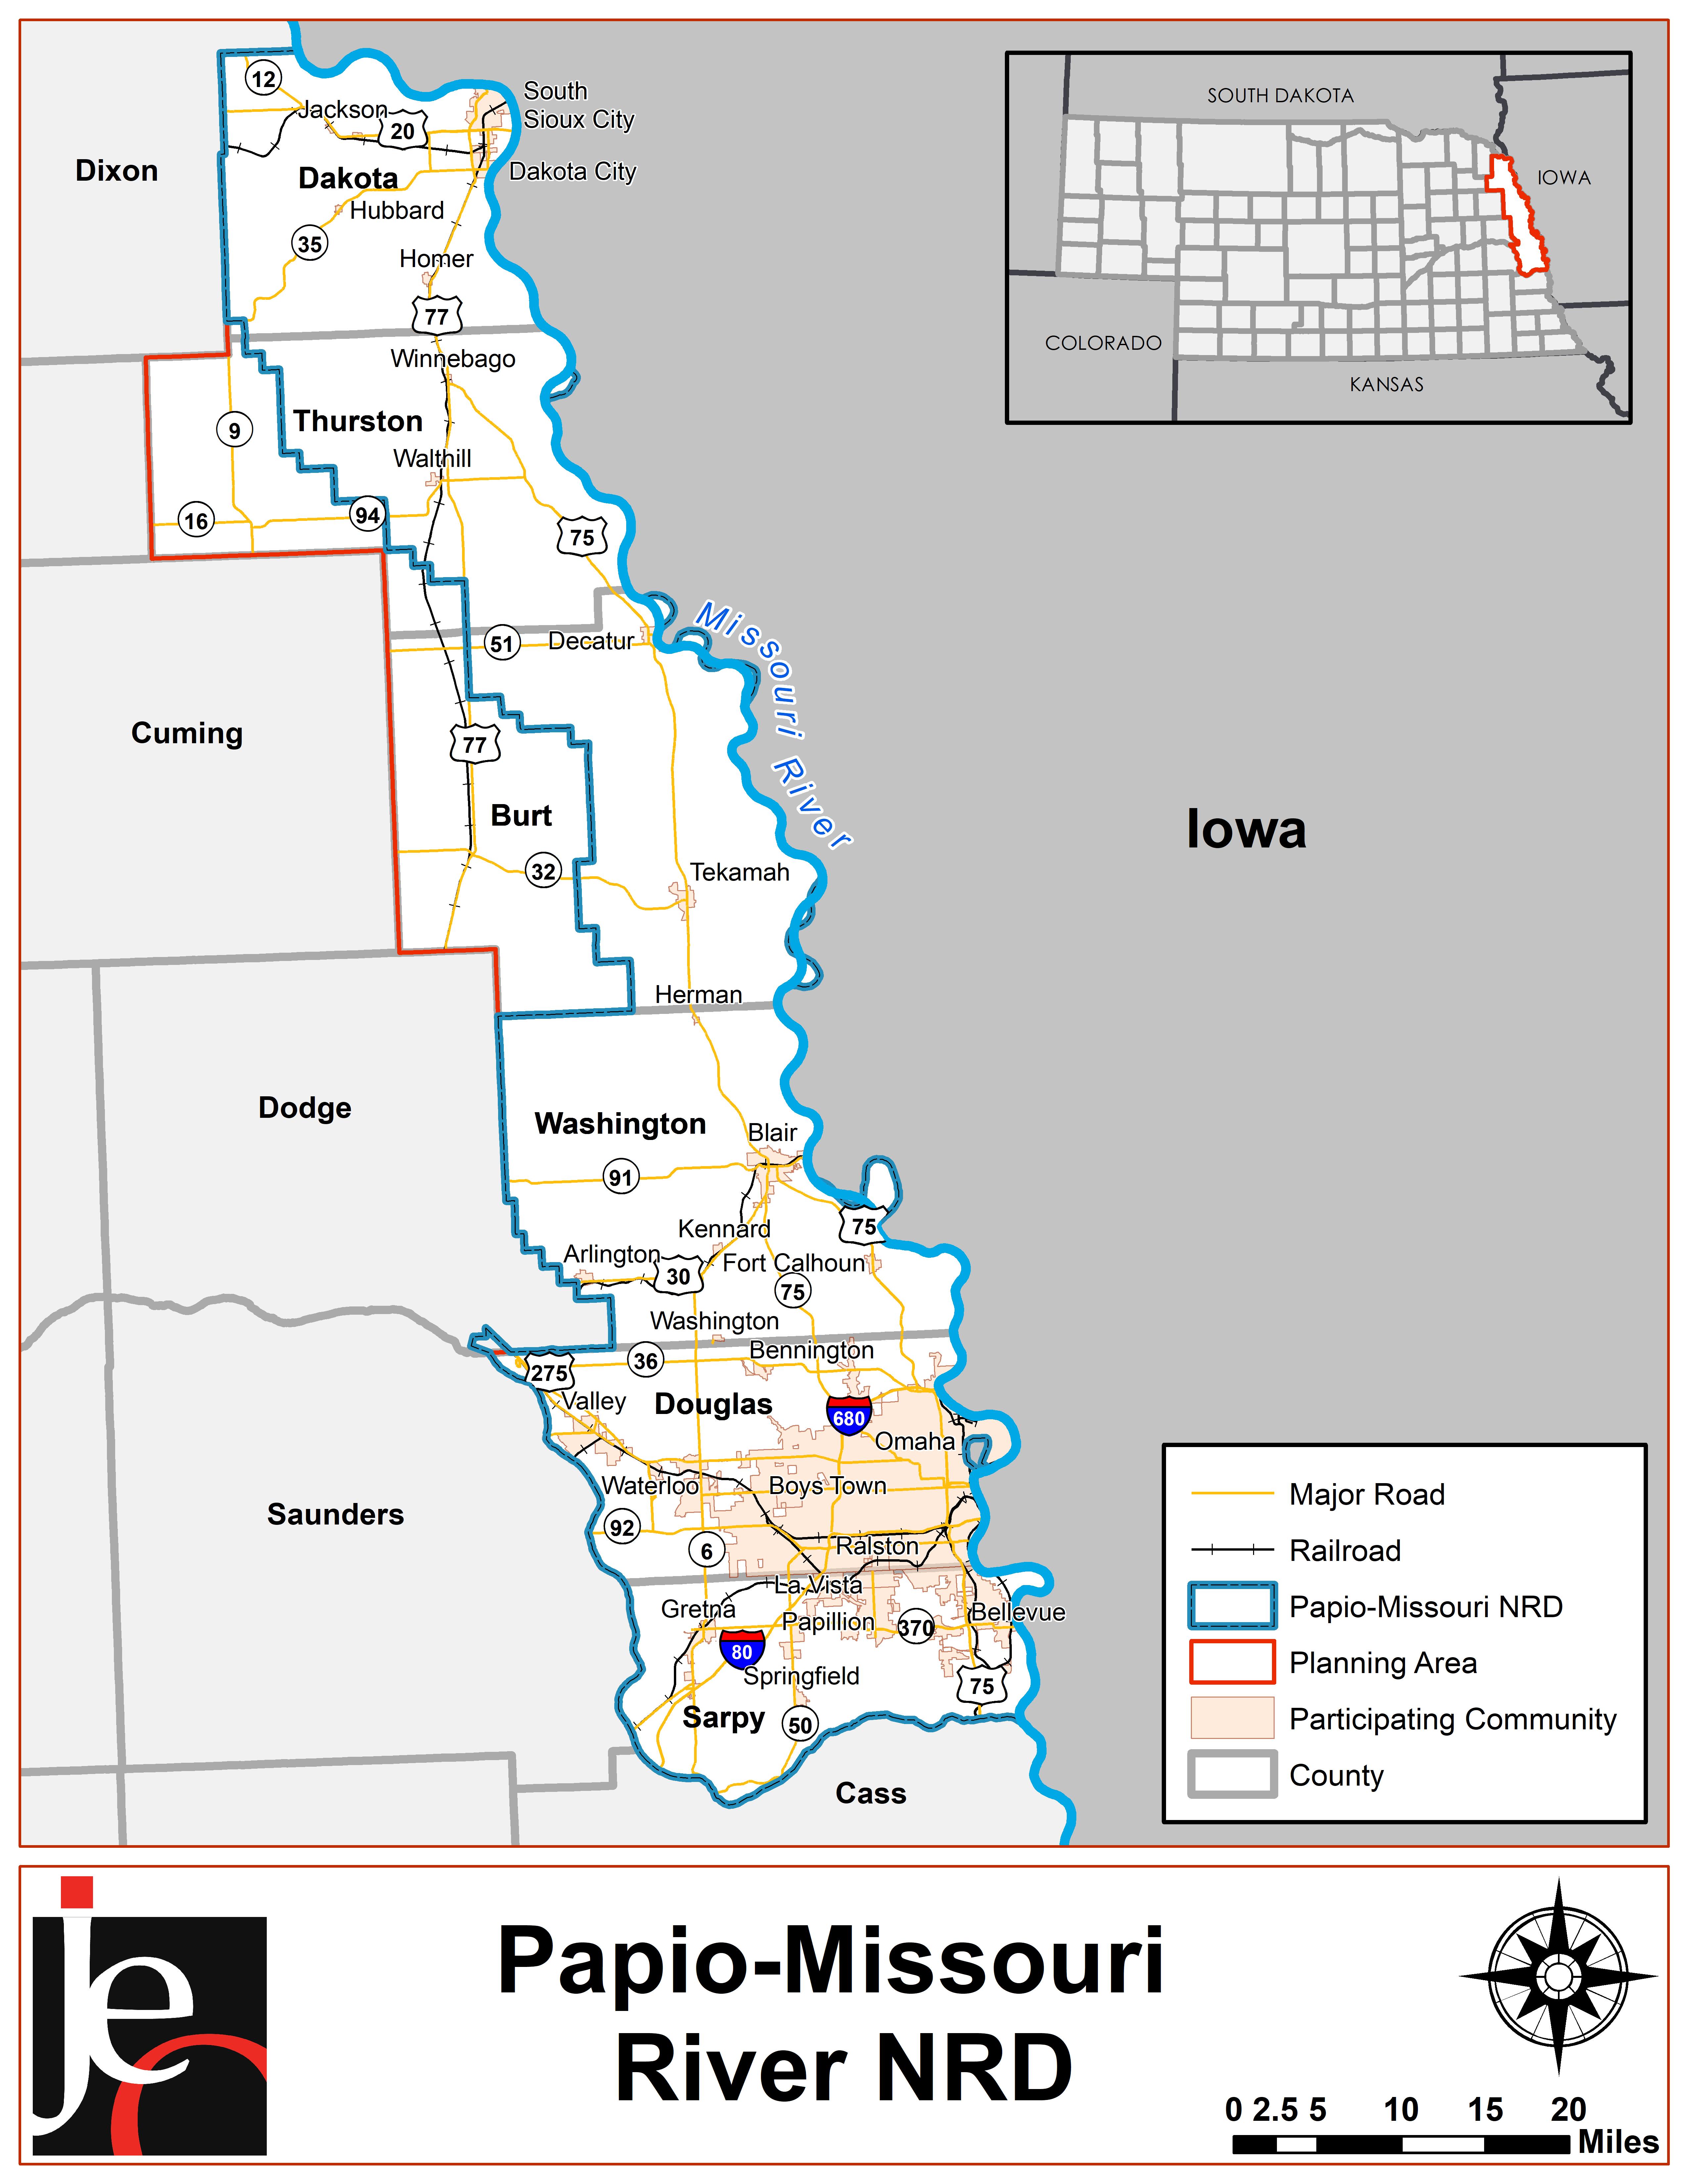 Papio-Missouri River NRD Map